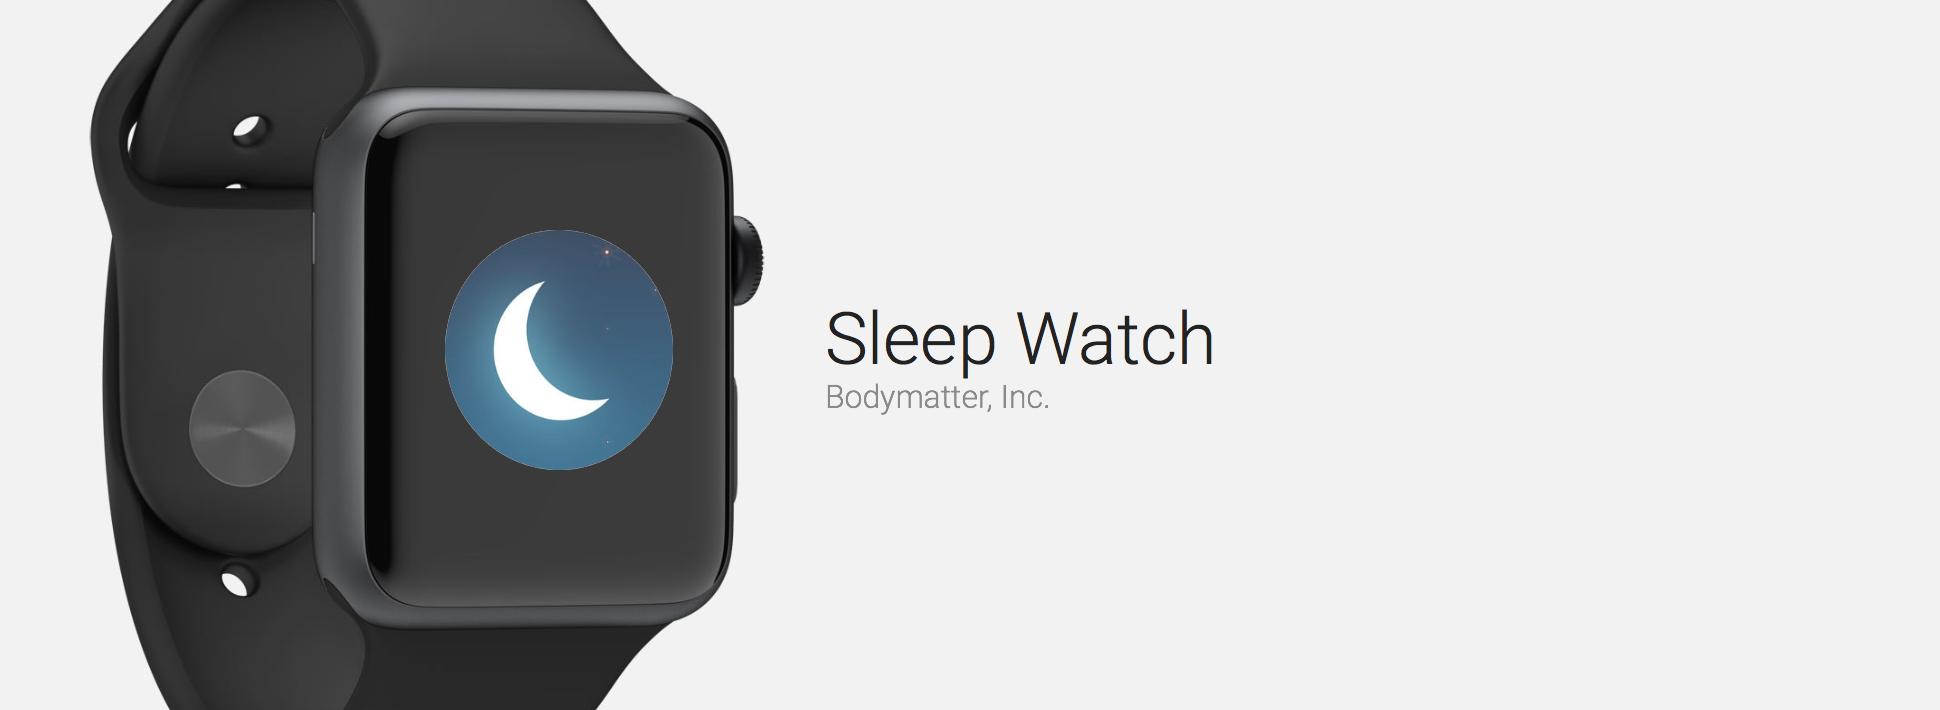 Sleep Watch Automatically Tracks Your Sleep